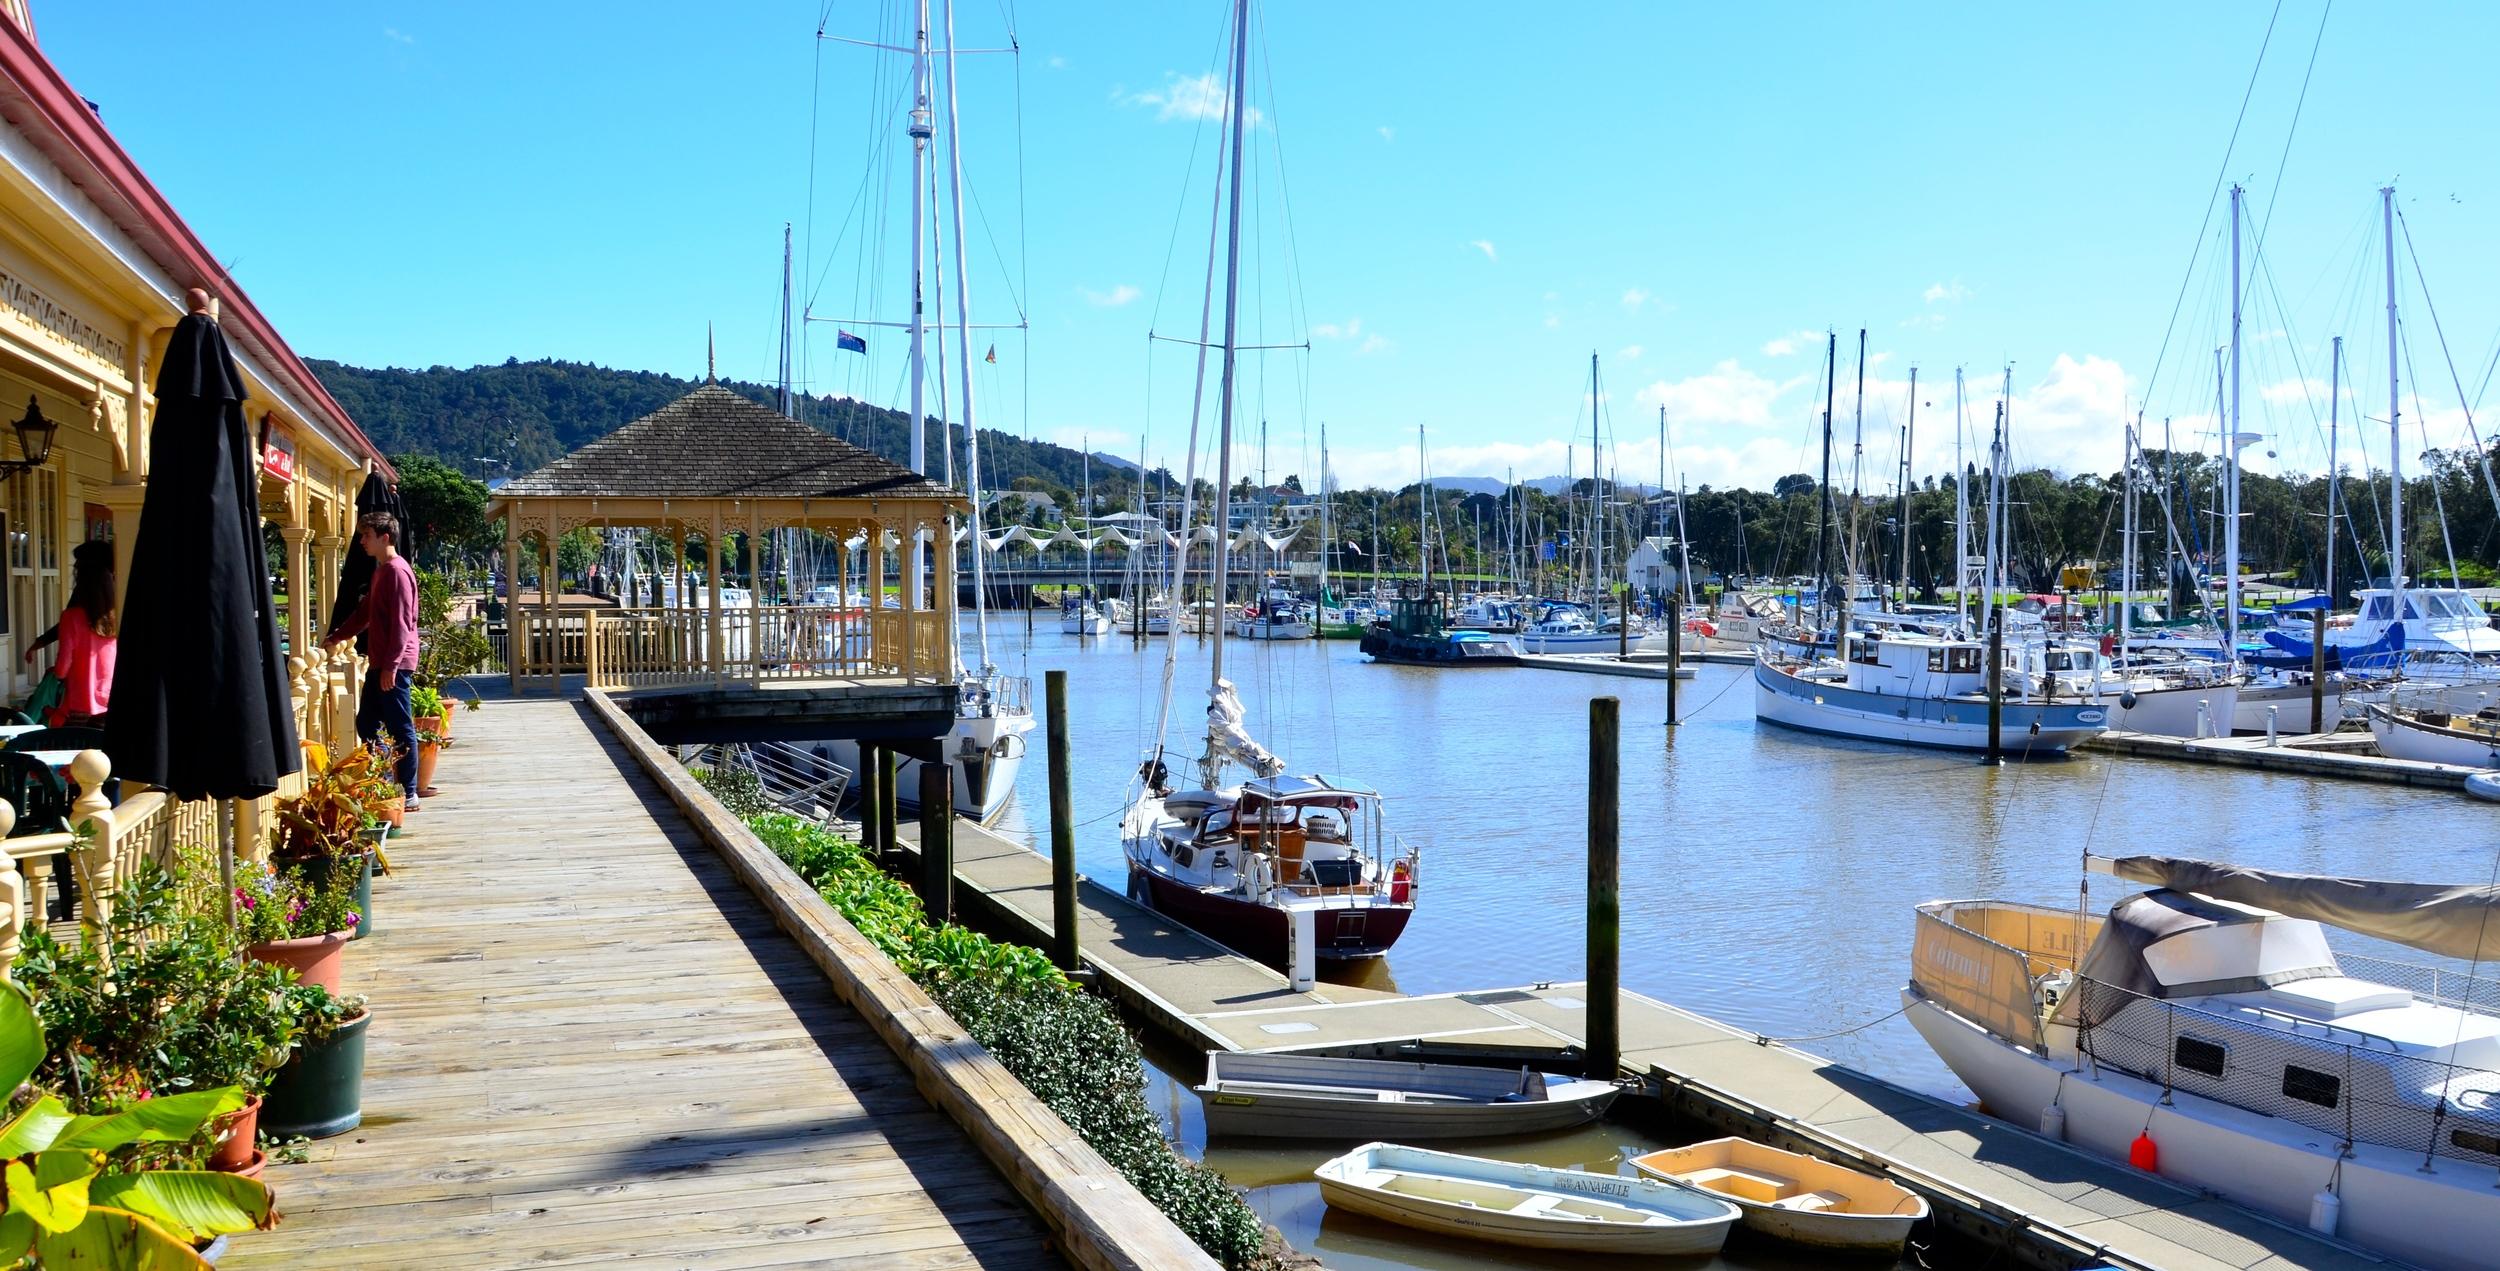 Whangarei Marina & Town Basin